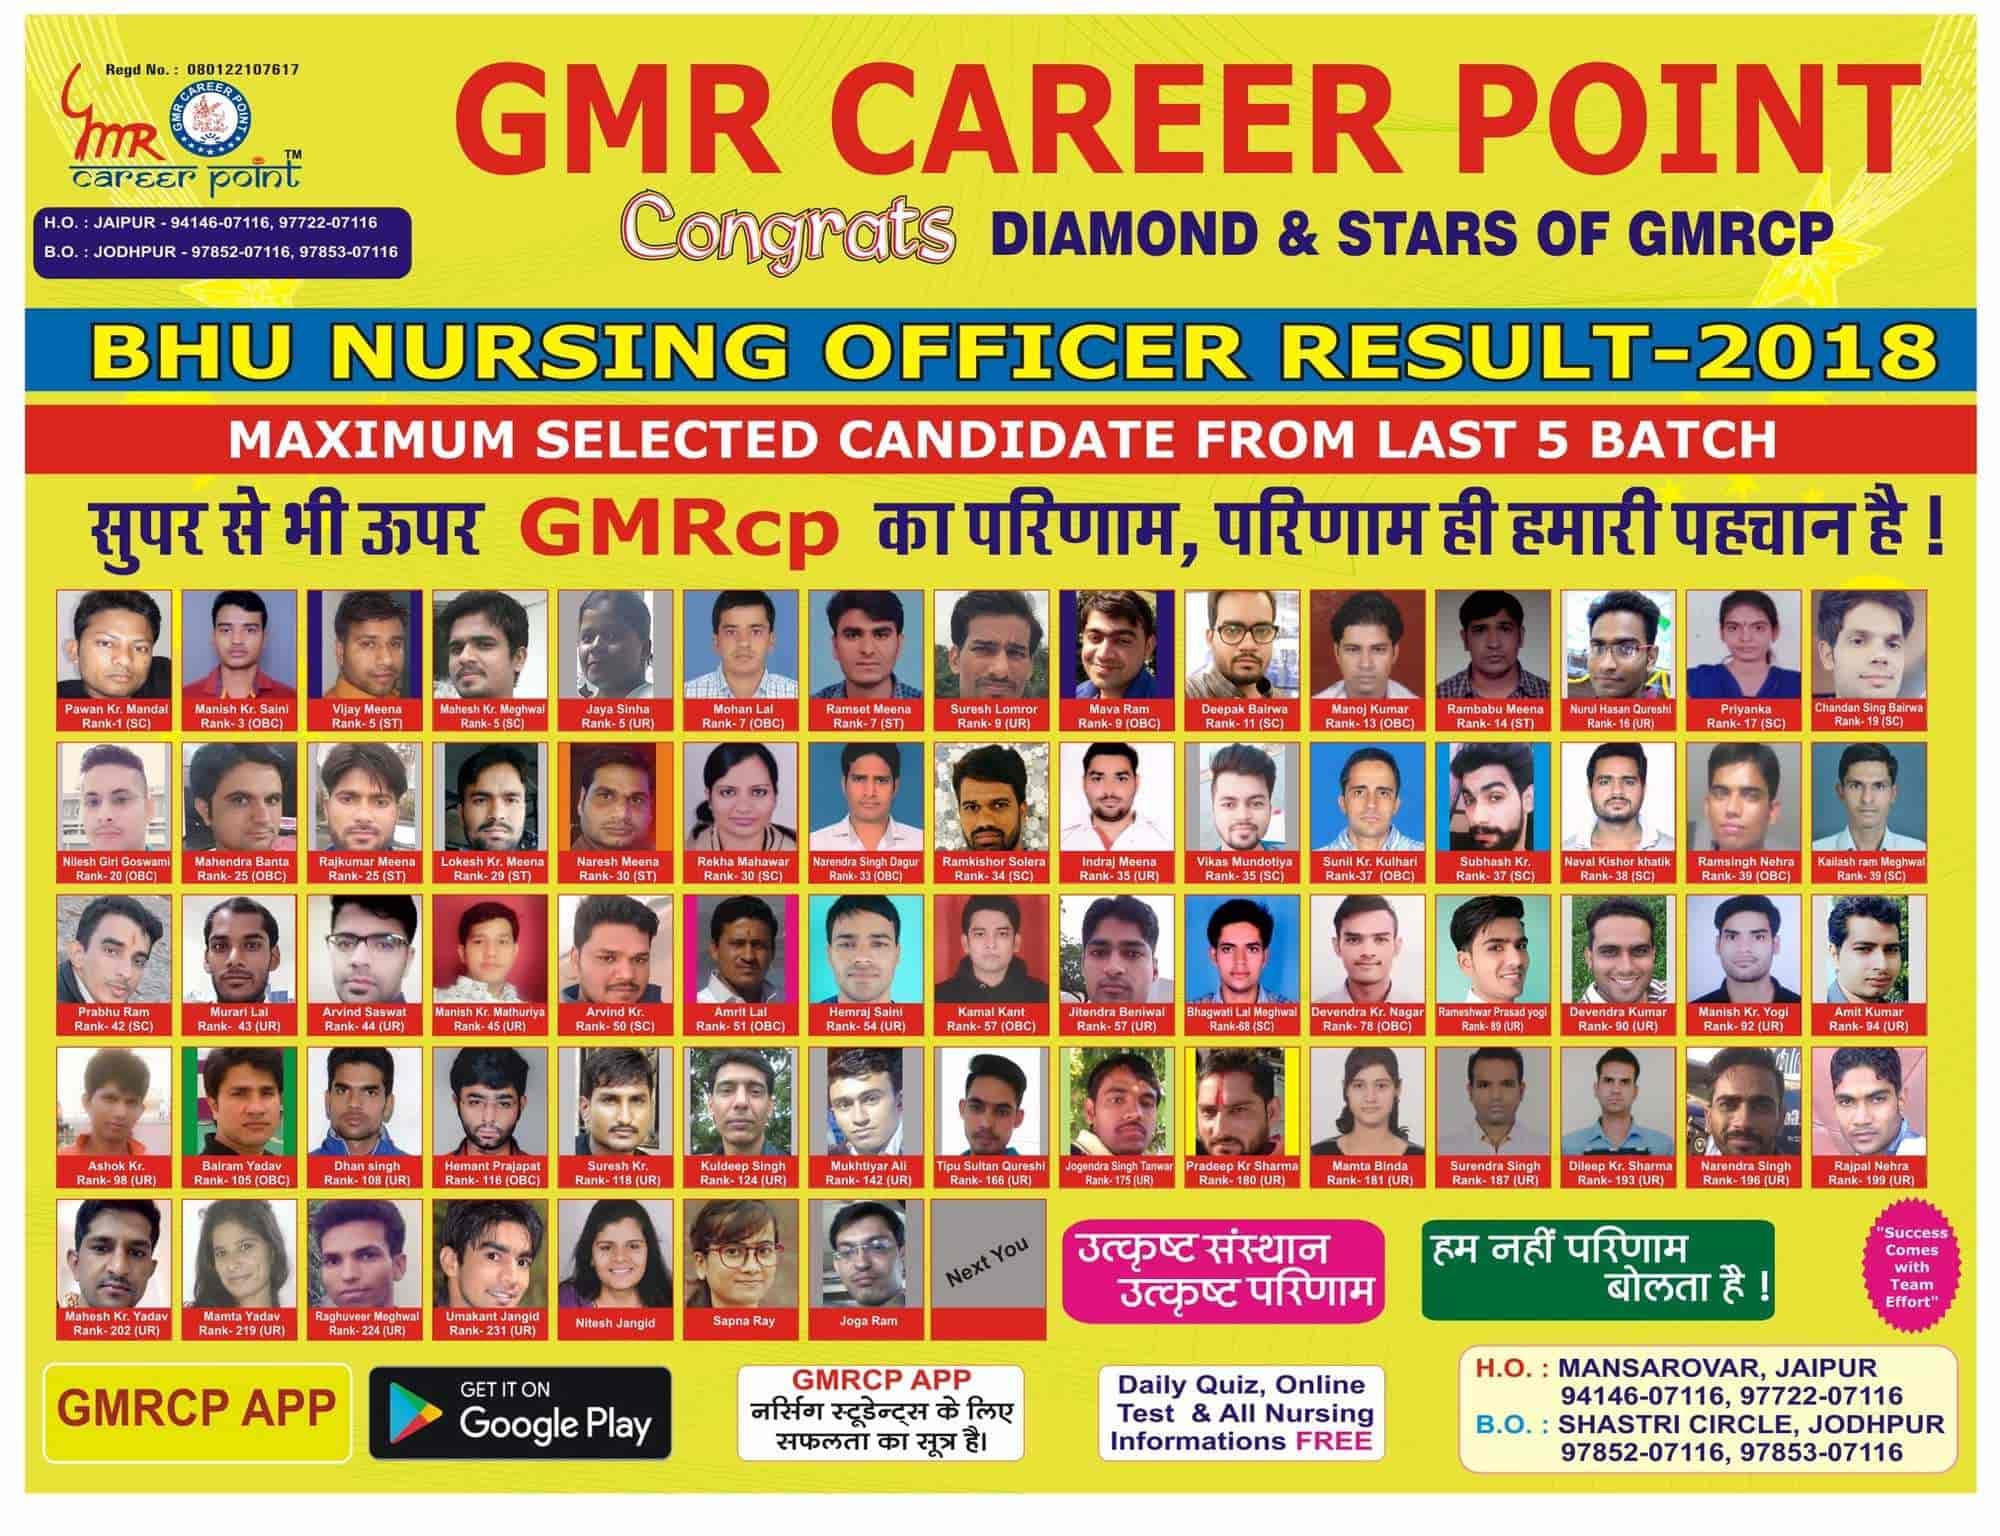 GMR Career Point Photos, Shastri Nagar, Jodhpur- Pictures & Images